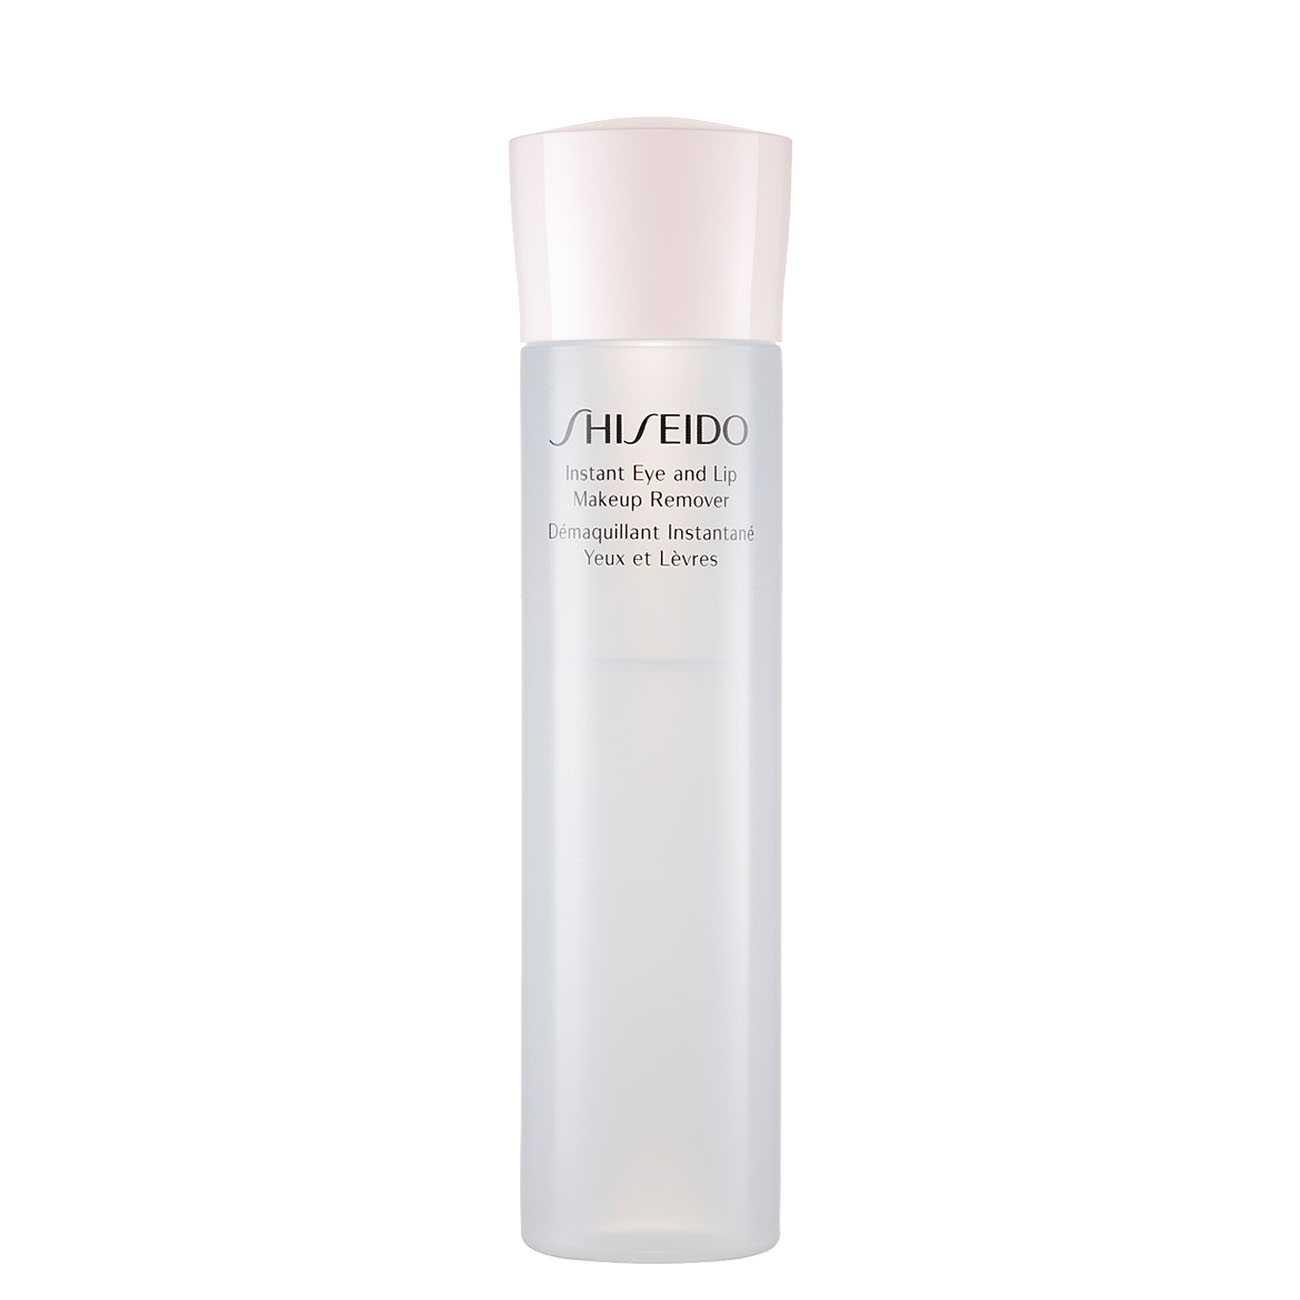 Instant Eye And Lip Makeup Remover 125 Ml Shiseido imagine 2021 bestvalue.eu